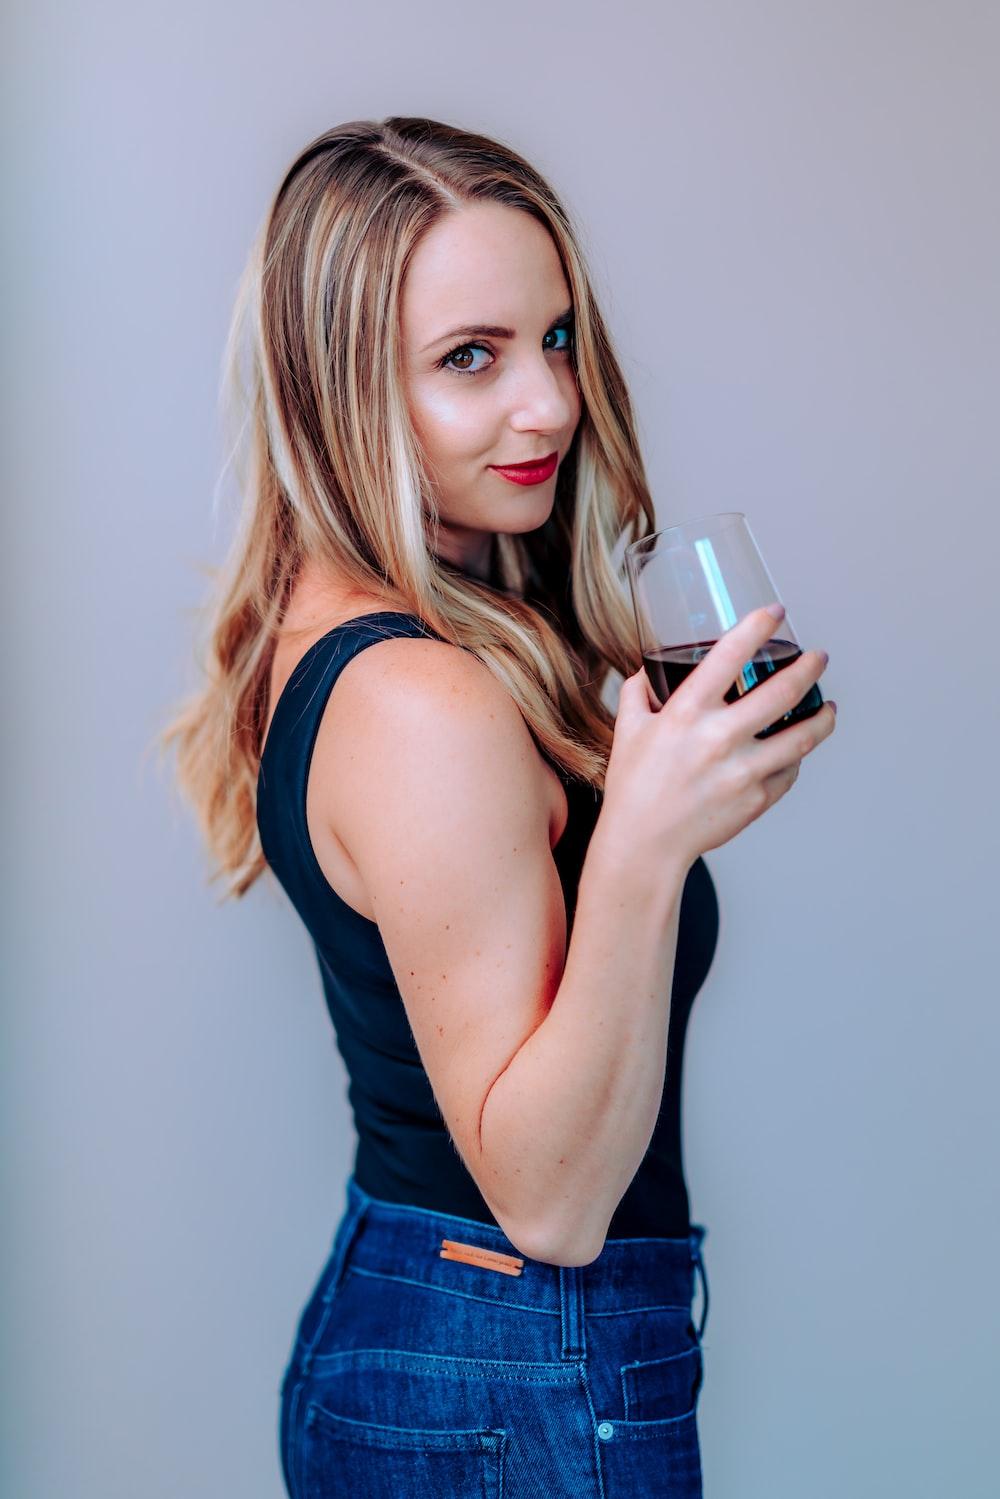 woman in blue tank top holding white ceramic mug